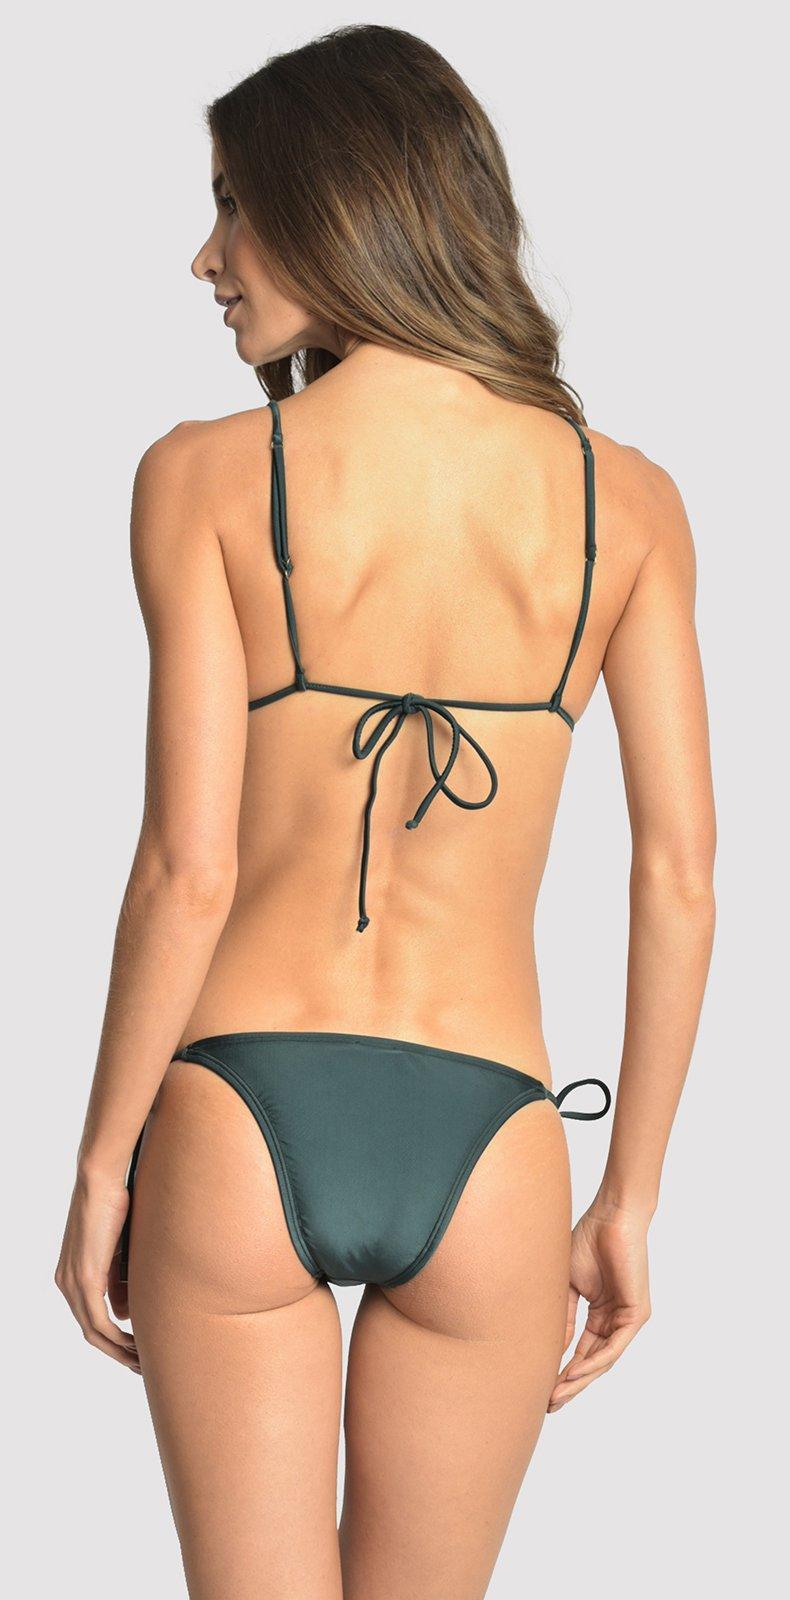 77a0271d74 ... Dark green accessorized Brazilian bikini - LONG HALTER STRING ATLANTIC